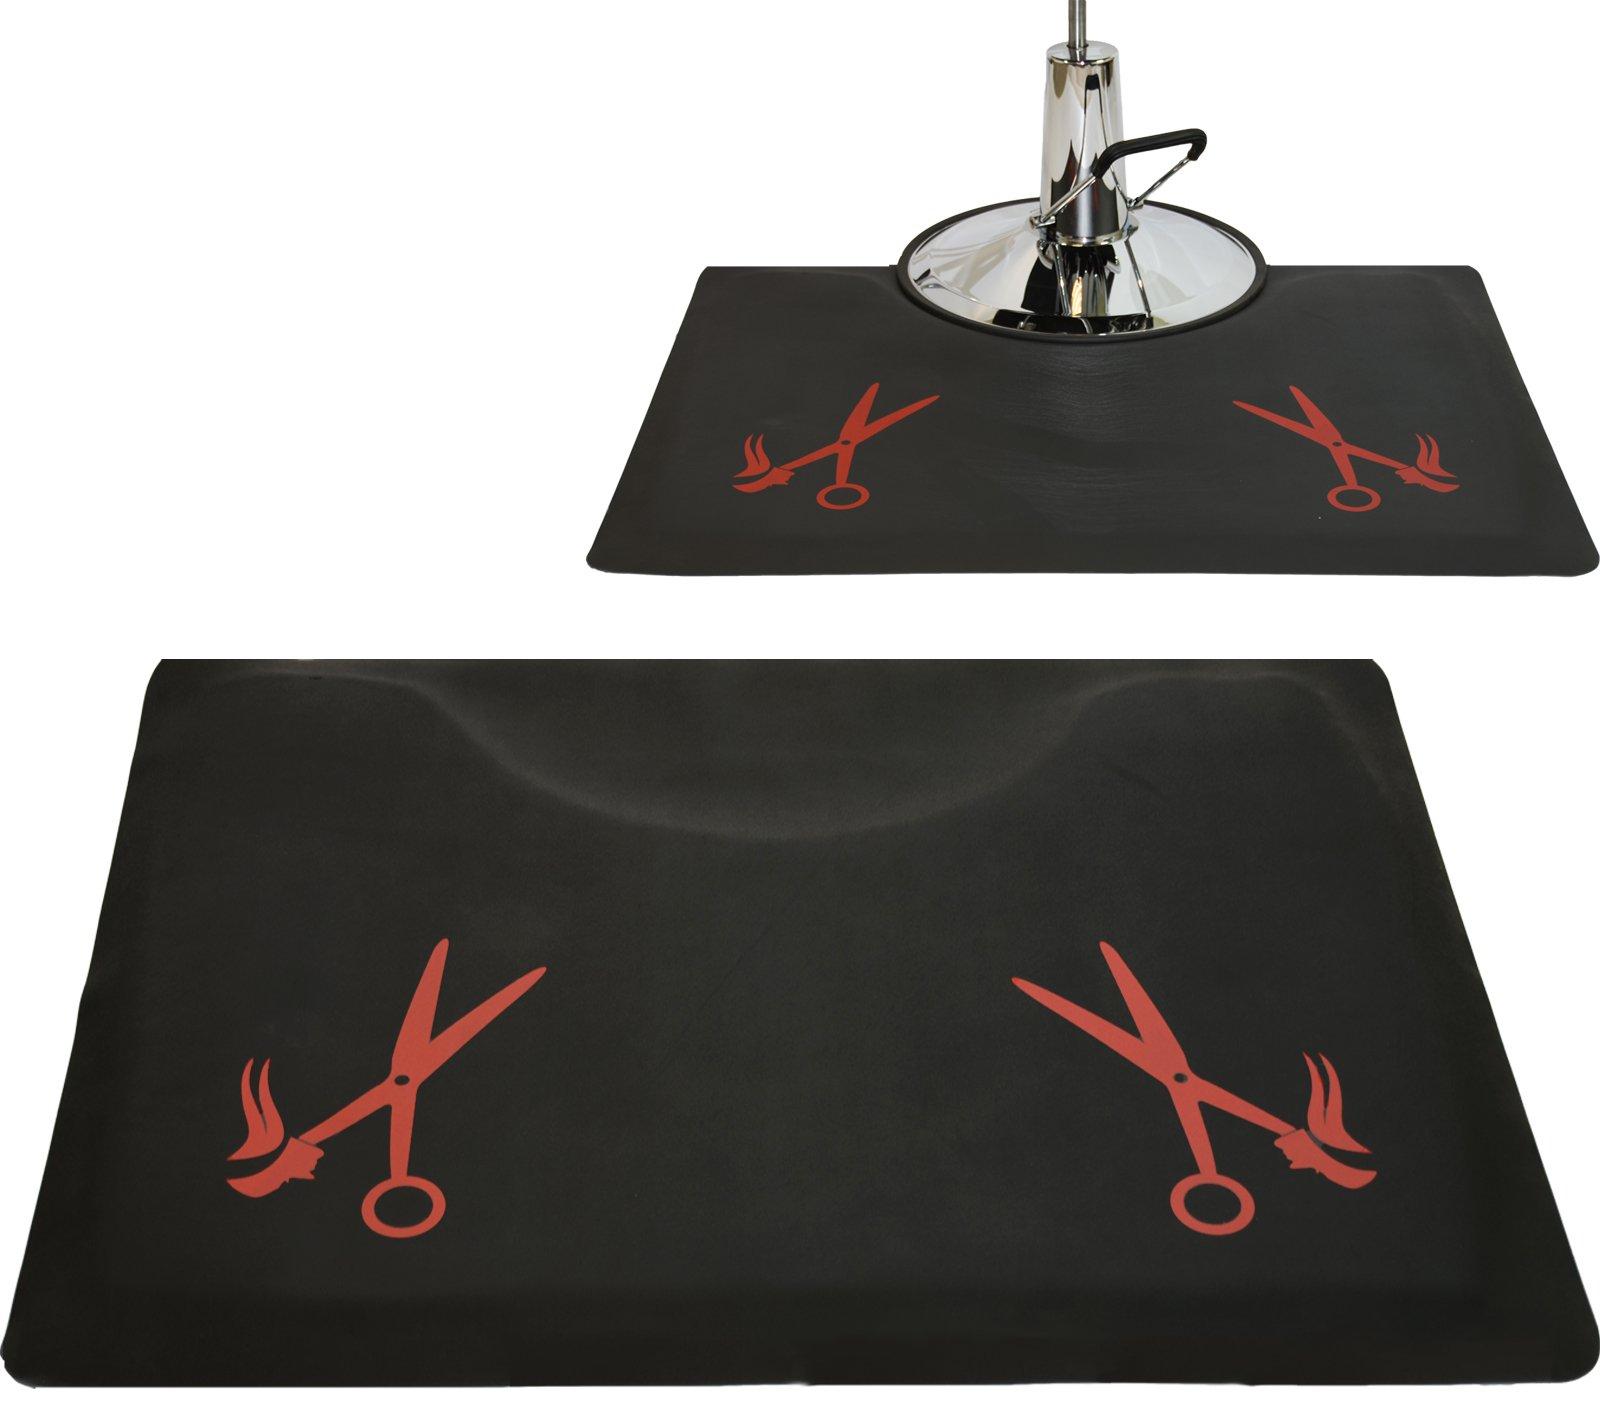 LCL Beauty 1/2'' Rectangle Anti Fatigue Beauty Barber Floor Mat with Red Salon Scissor Design